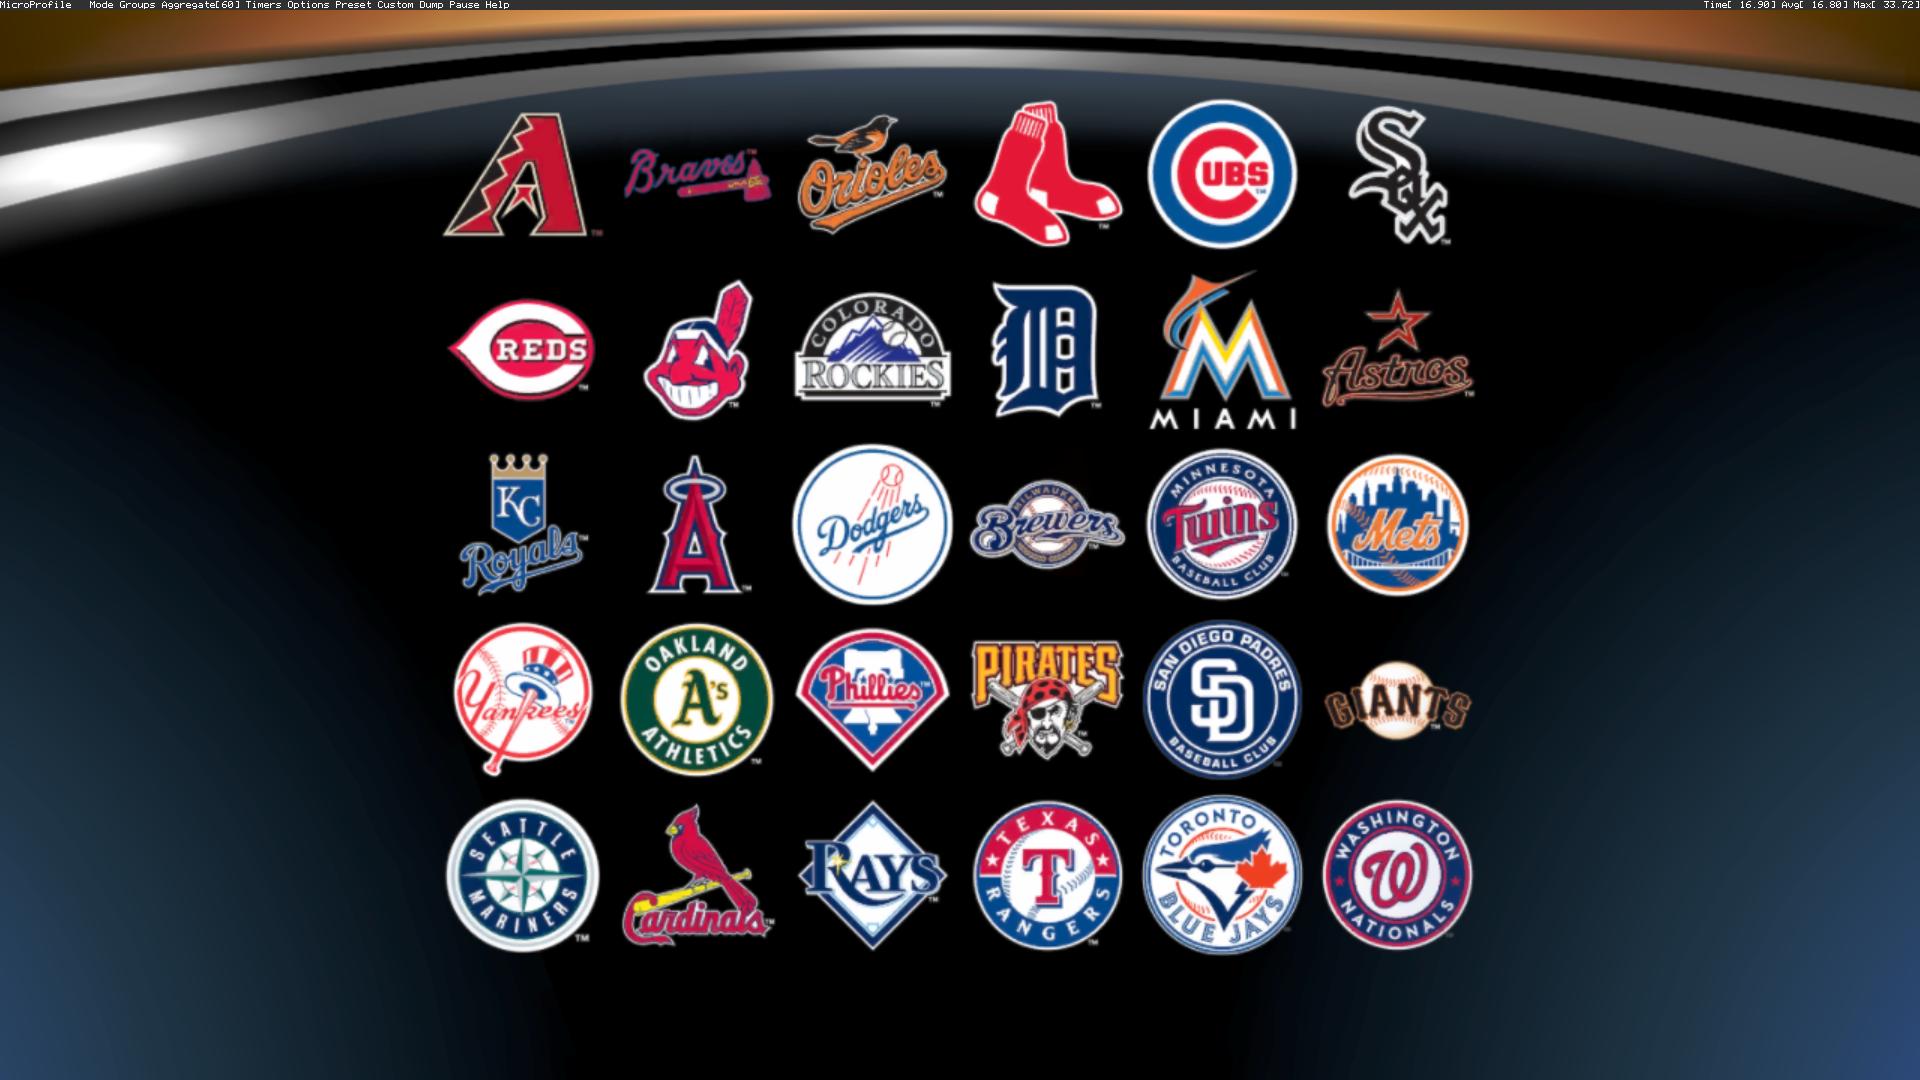 5454089E - Major League Baseball - 2K12 · Issue #549 · xenia